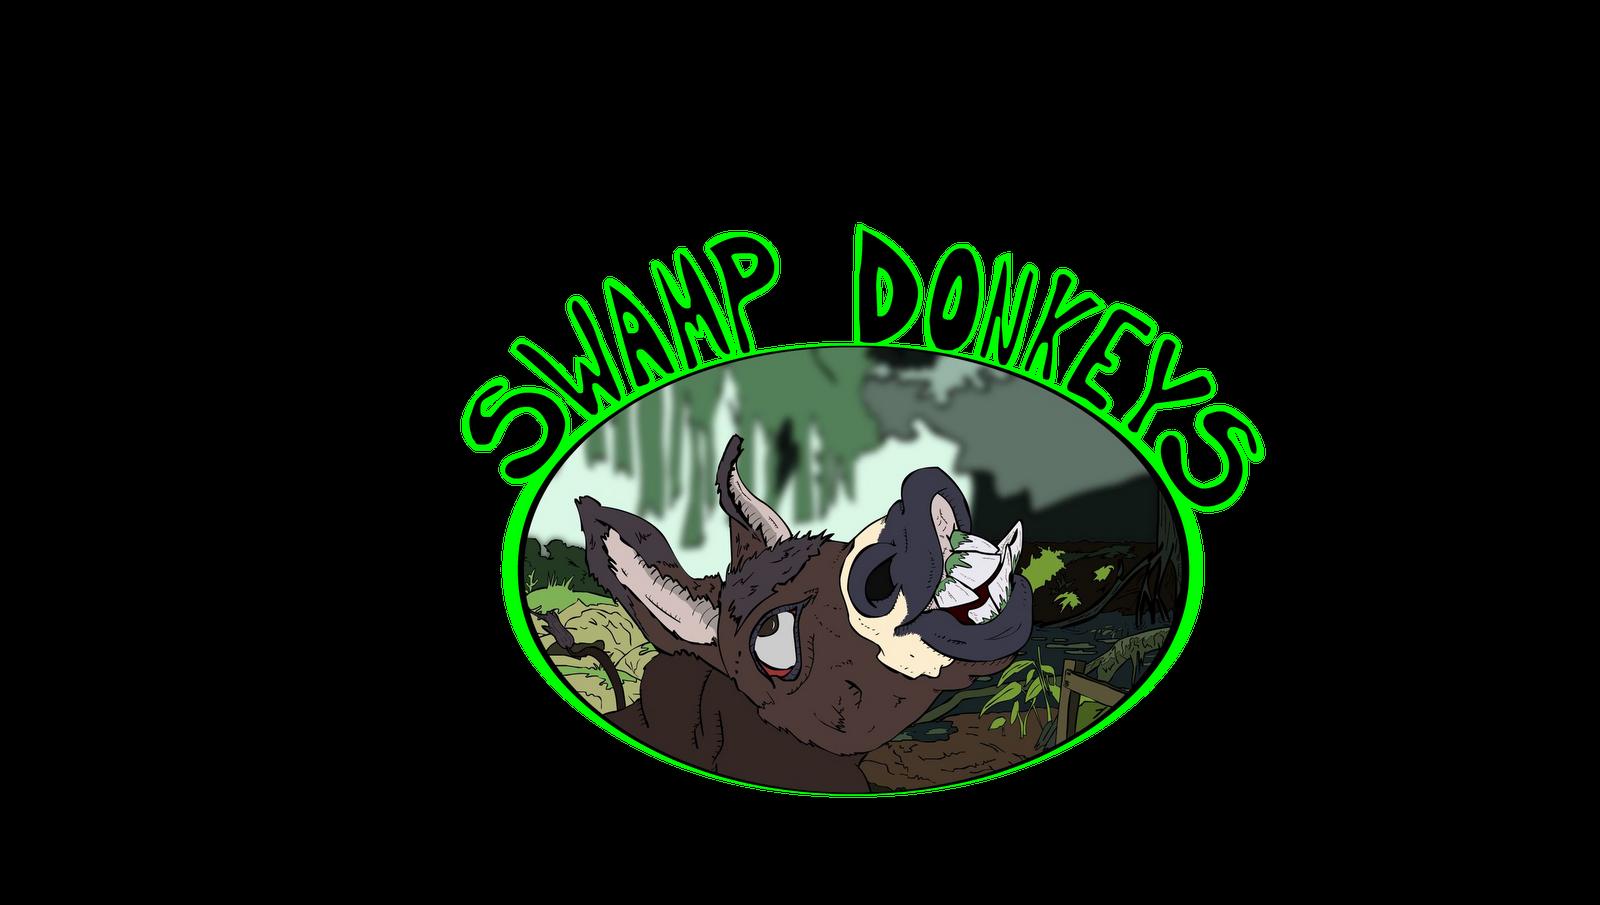 1600x905 Swamp Donkeys Graphic Logo Design Witmart